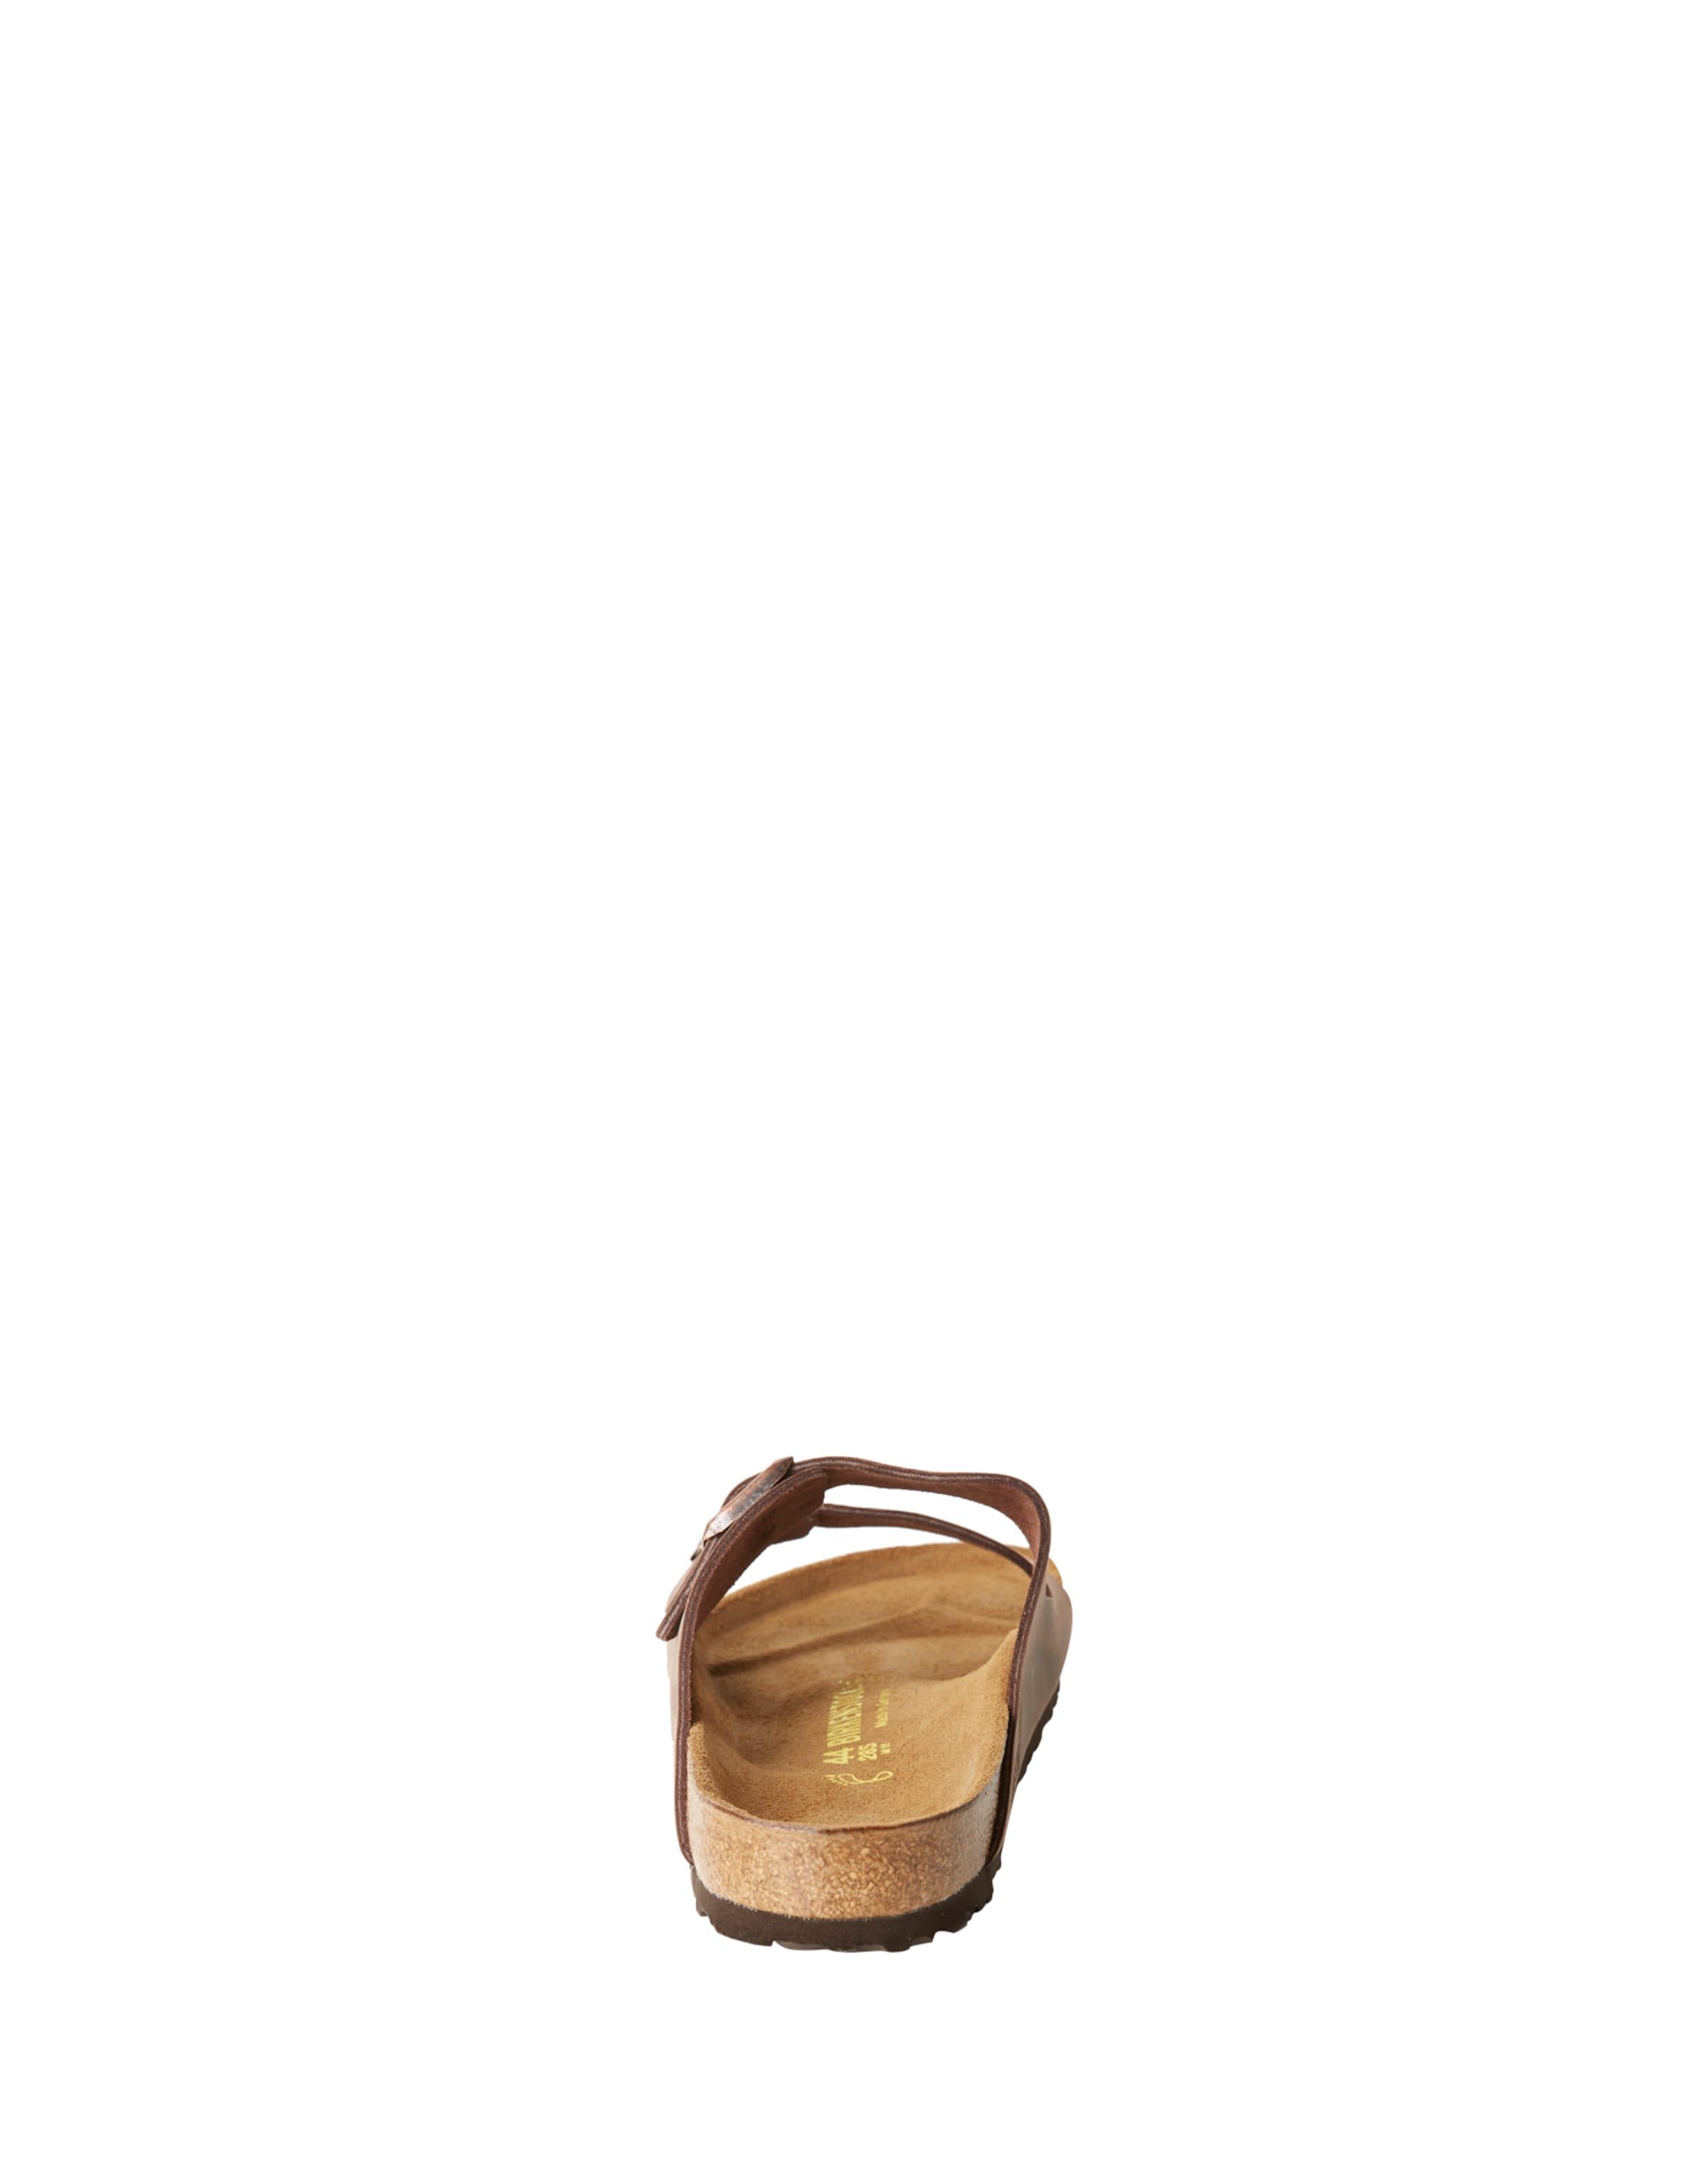 Braun Pantoletten Birkenstock In Pantoletten Birkenstock 'arizona' hxsotQrdCB